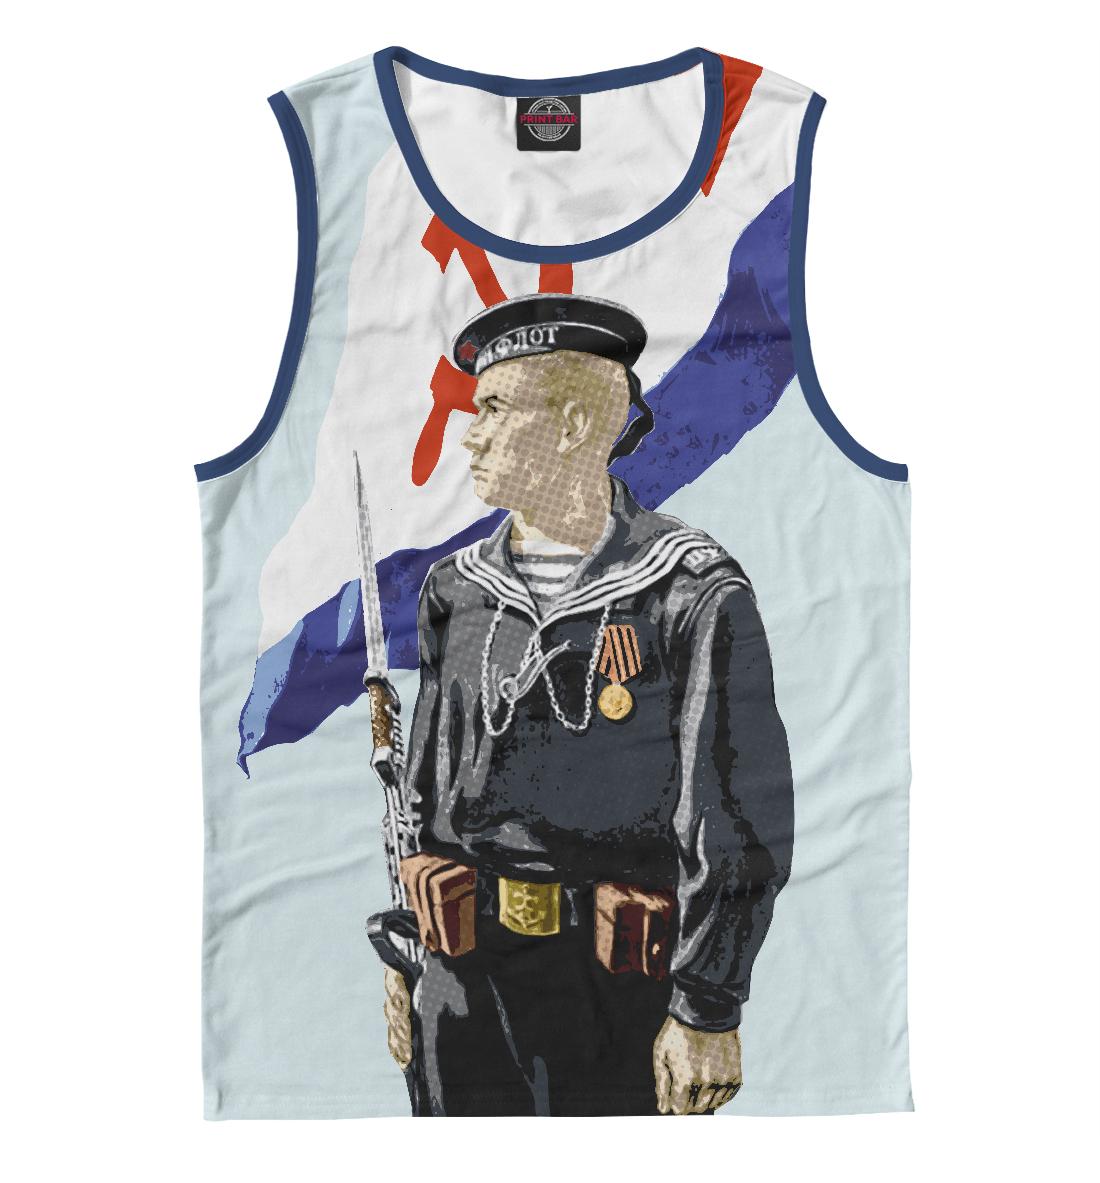 Купить ВМФ - Рулит!, Printbar, Майки, VMF-377186-may-2